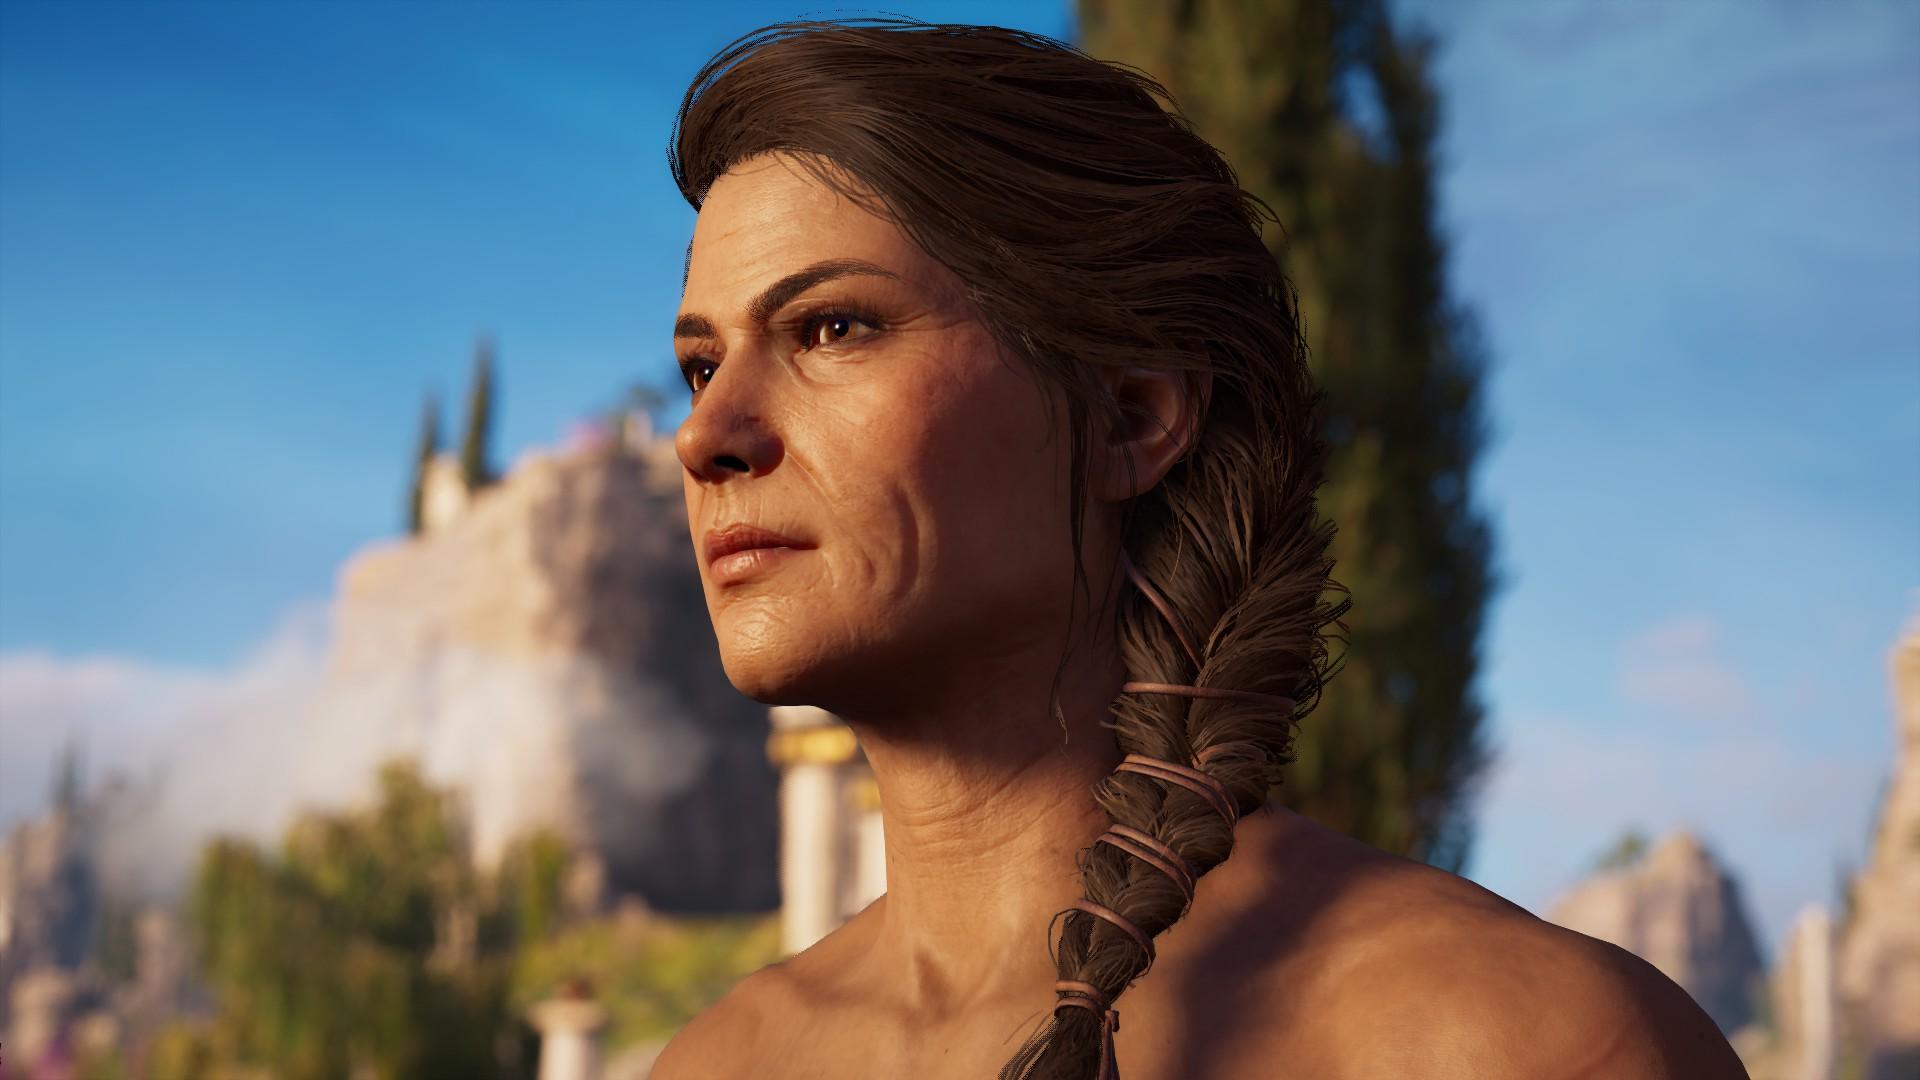 Assassins Creed Odysseys เดิมทีจะมีแค่ตัวละคร Kassandra